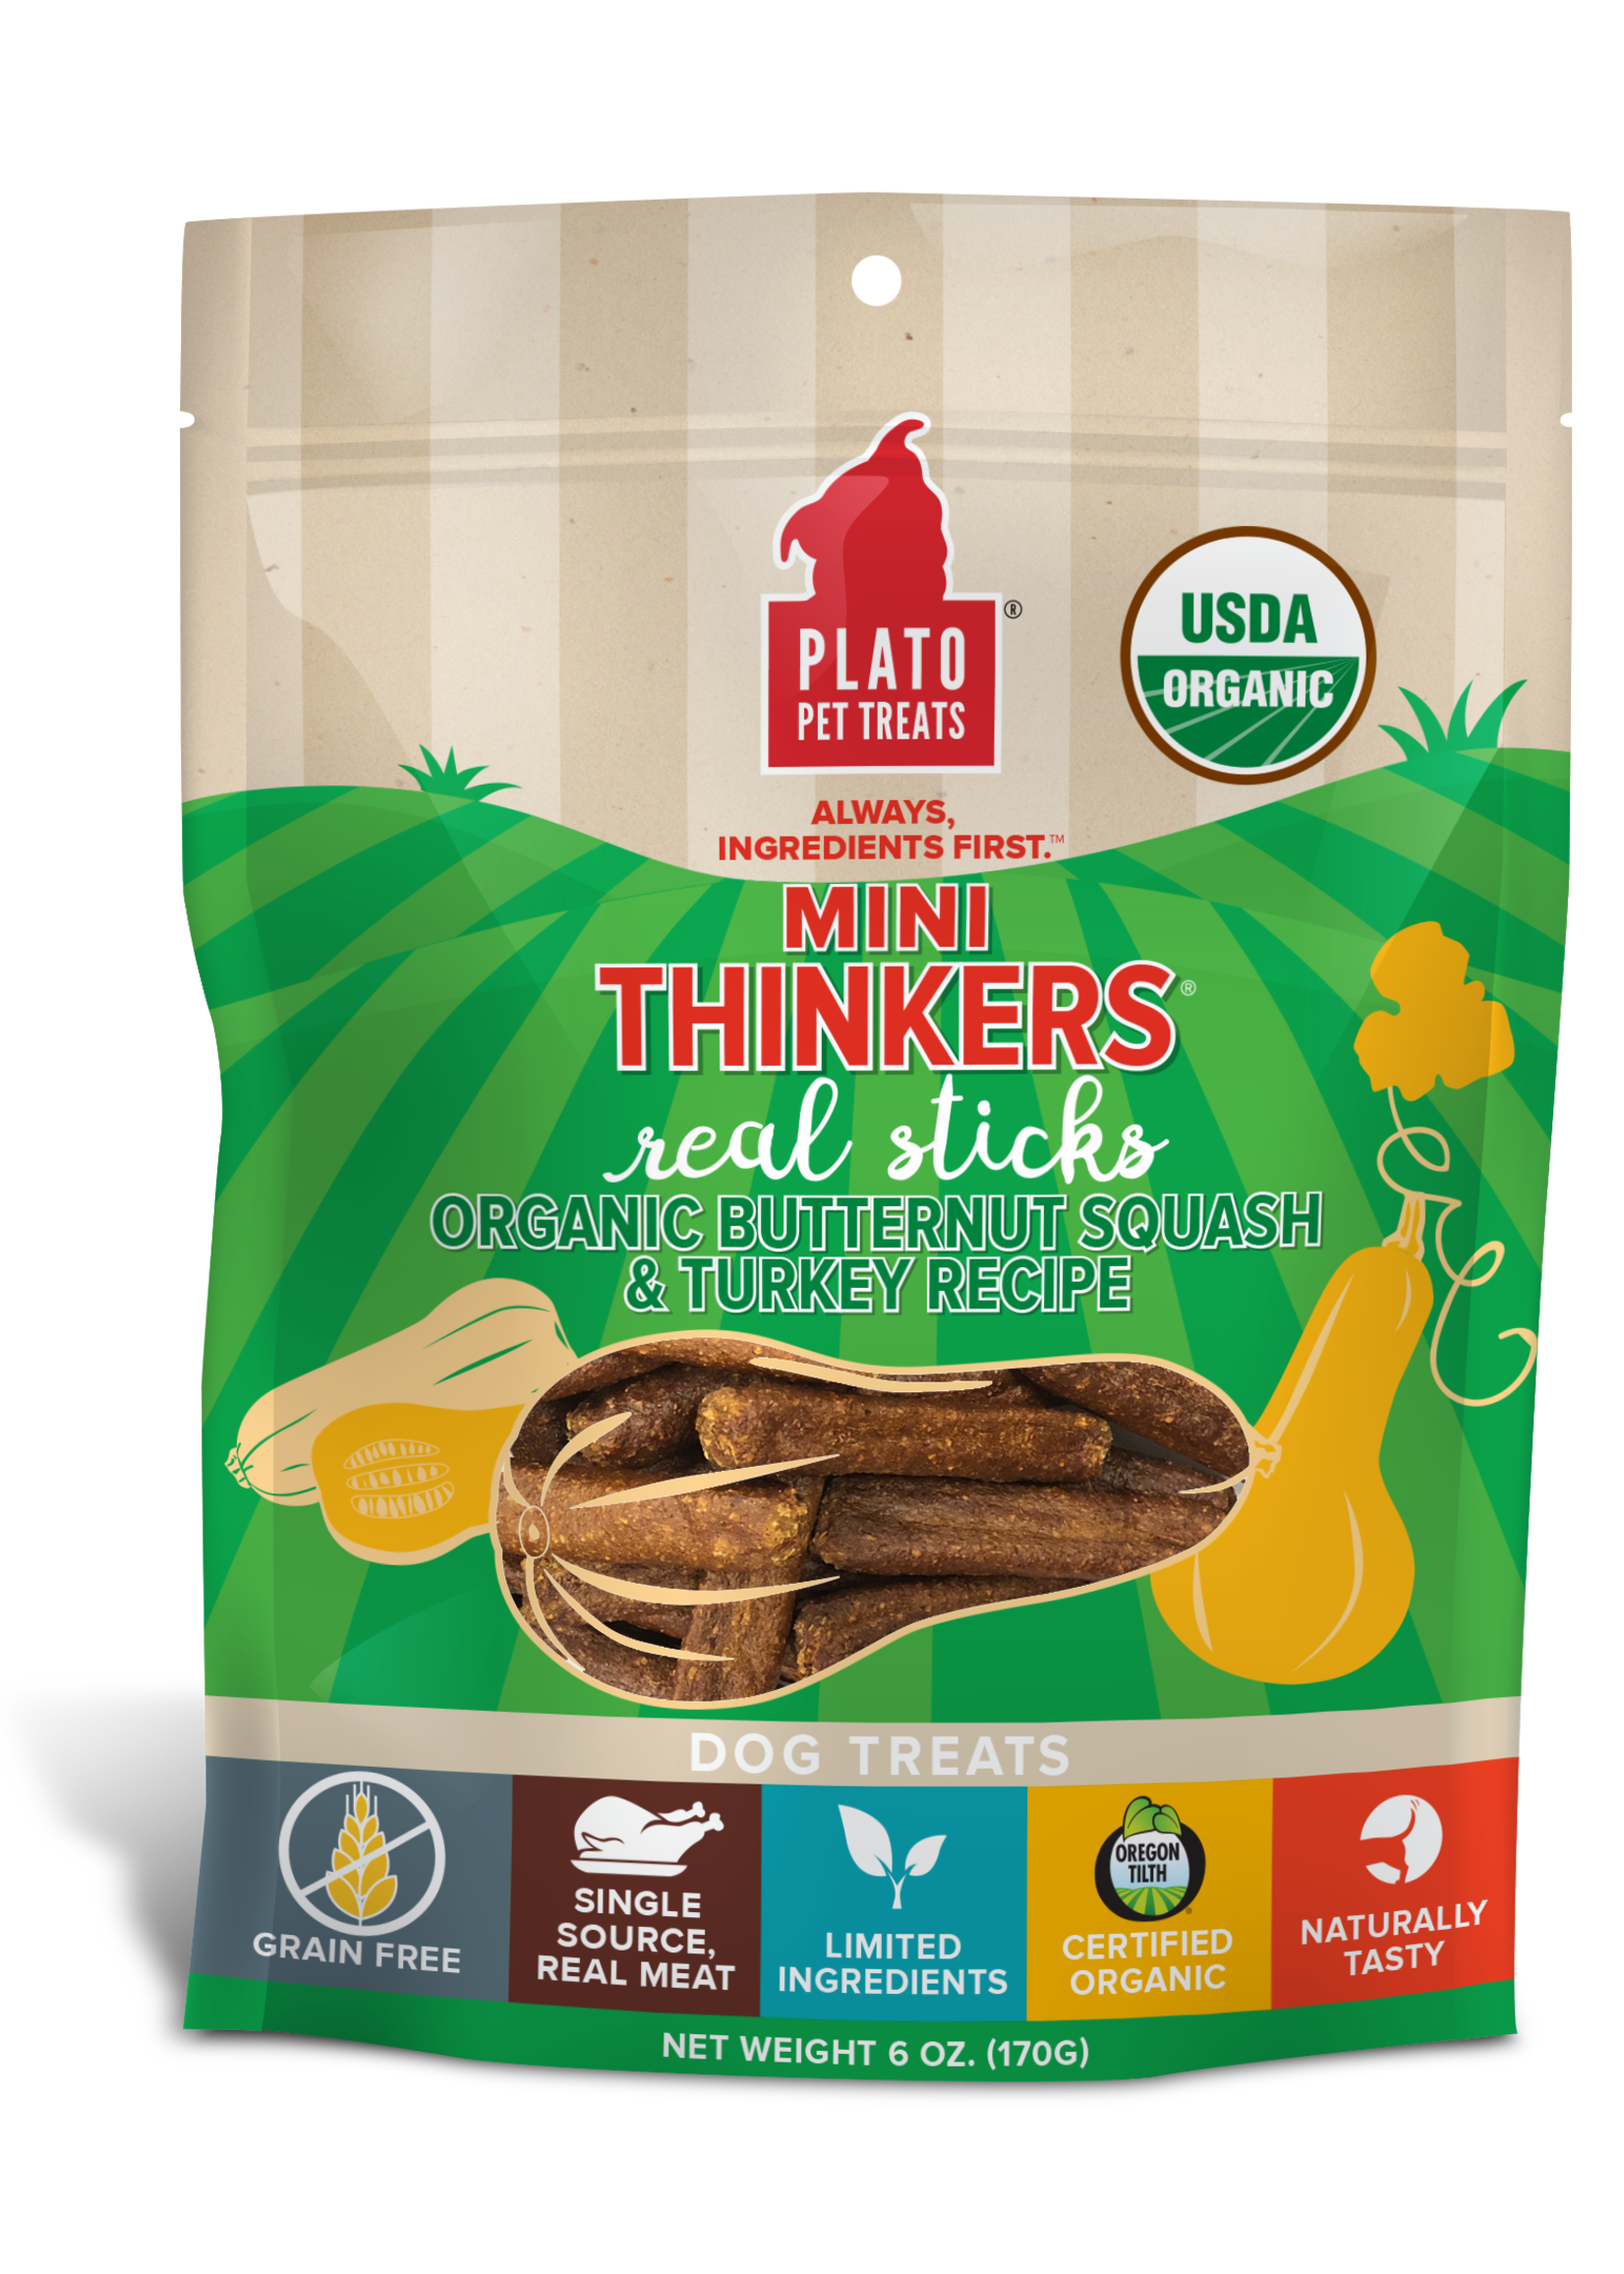 Plato Pet Treats - KDR Plato Mini Thinkers Organic Turkey & Squash 6oz